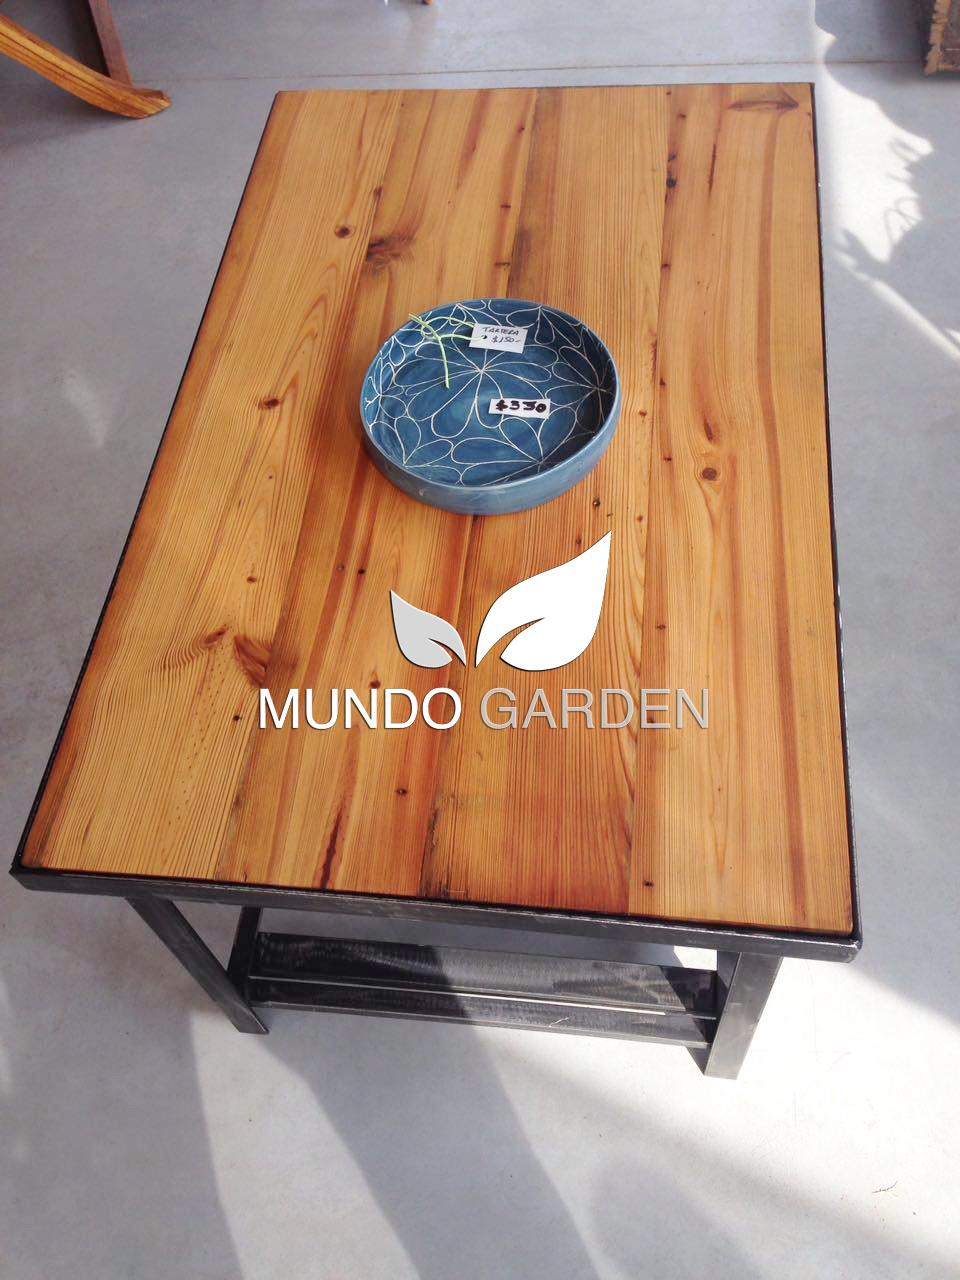 Mundo garden mesa ratona madera y hierro - Mesa madera industrial ...